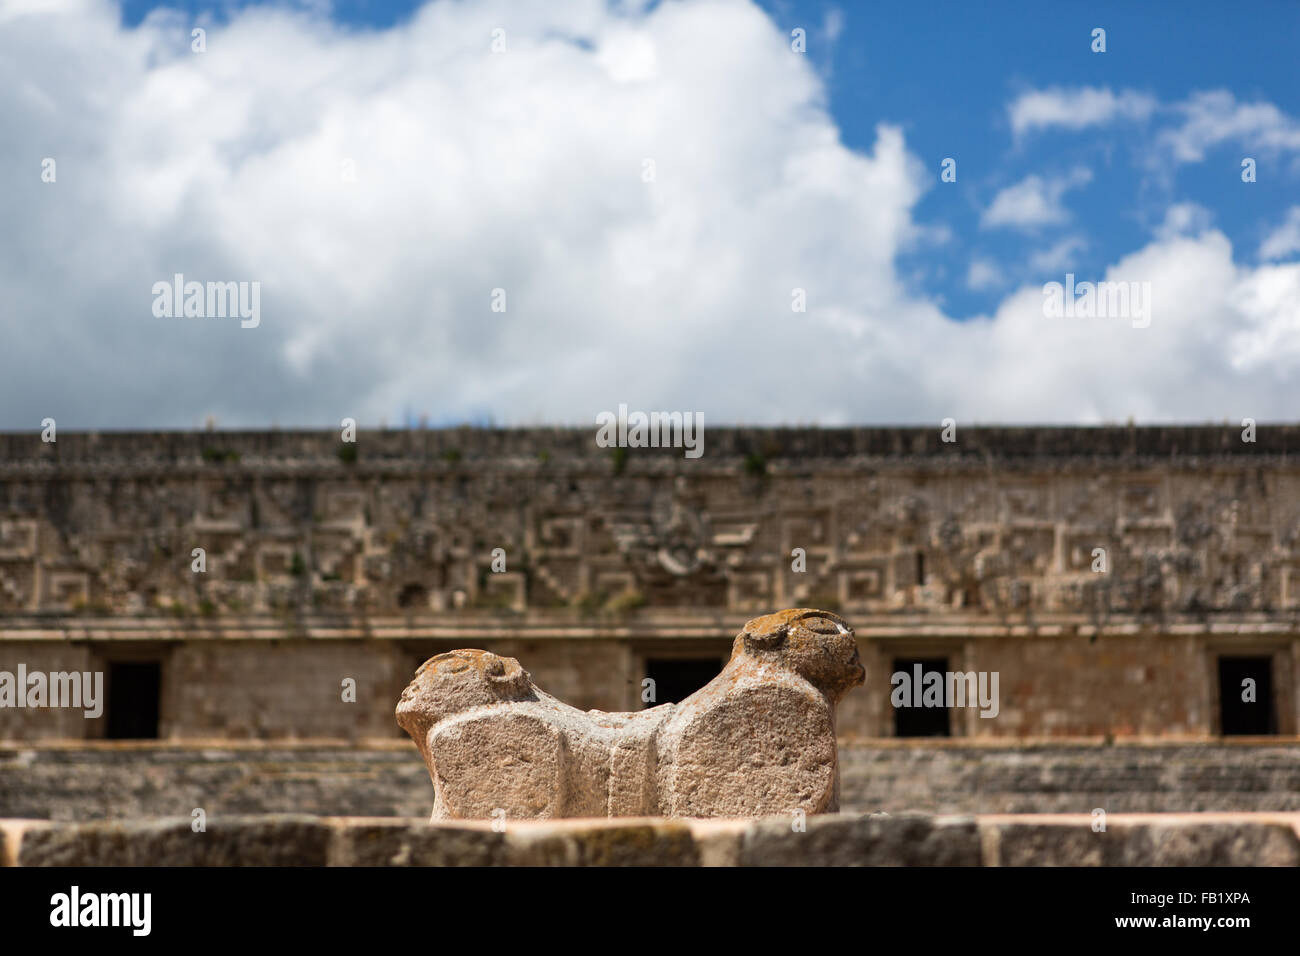 Ruins at Uxmal, Yucatan, Mexico. It is an ancient Maya city of the classical period. - Stock Image